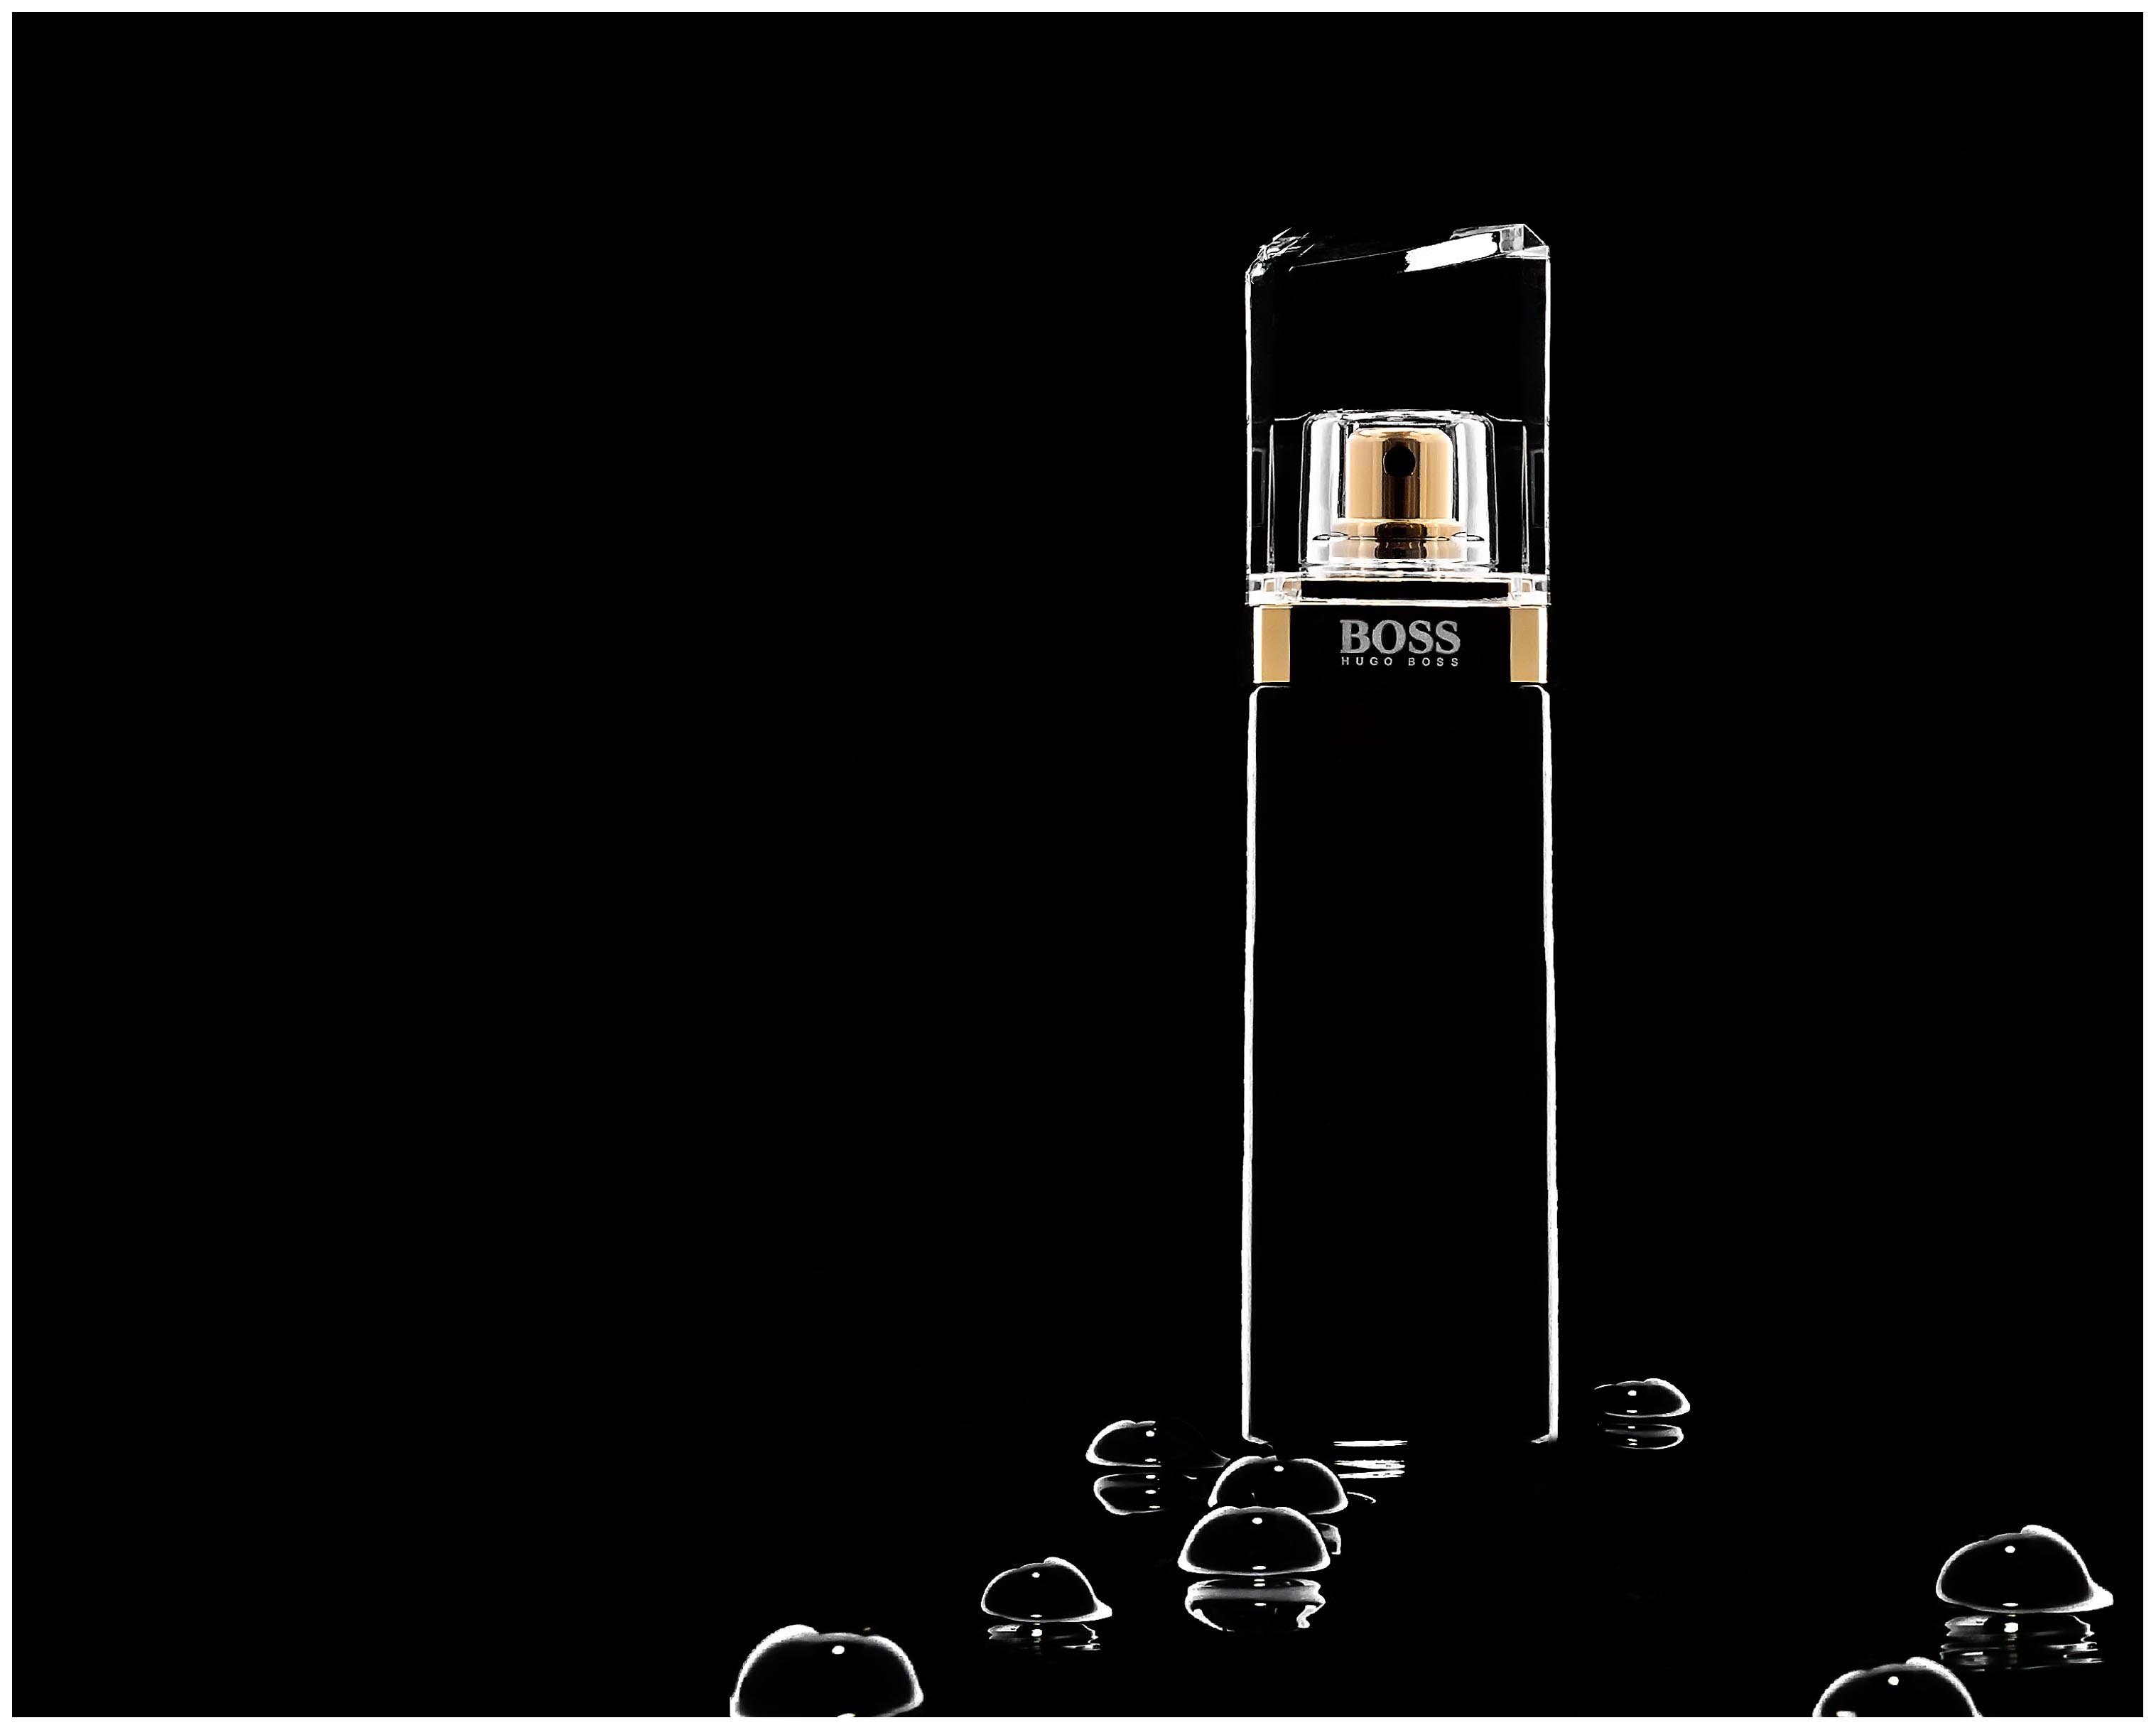 Hugo Boss Nuit Pour Femme Eau De Parfum Darrell Steele Photography